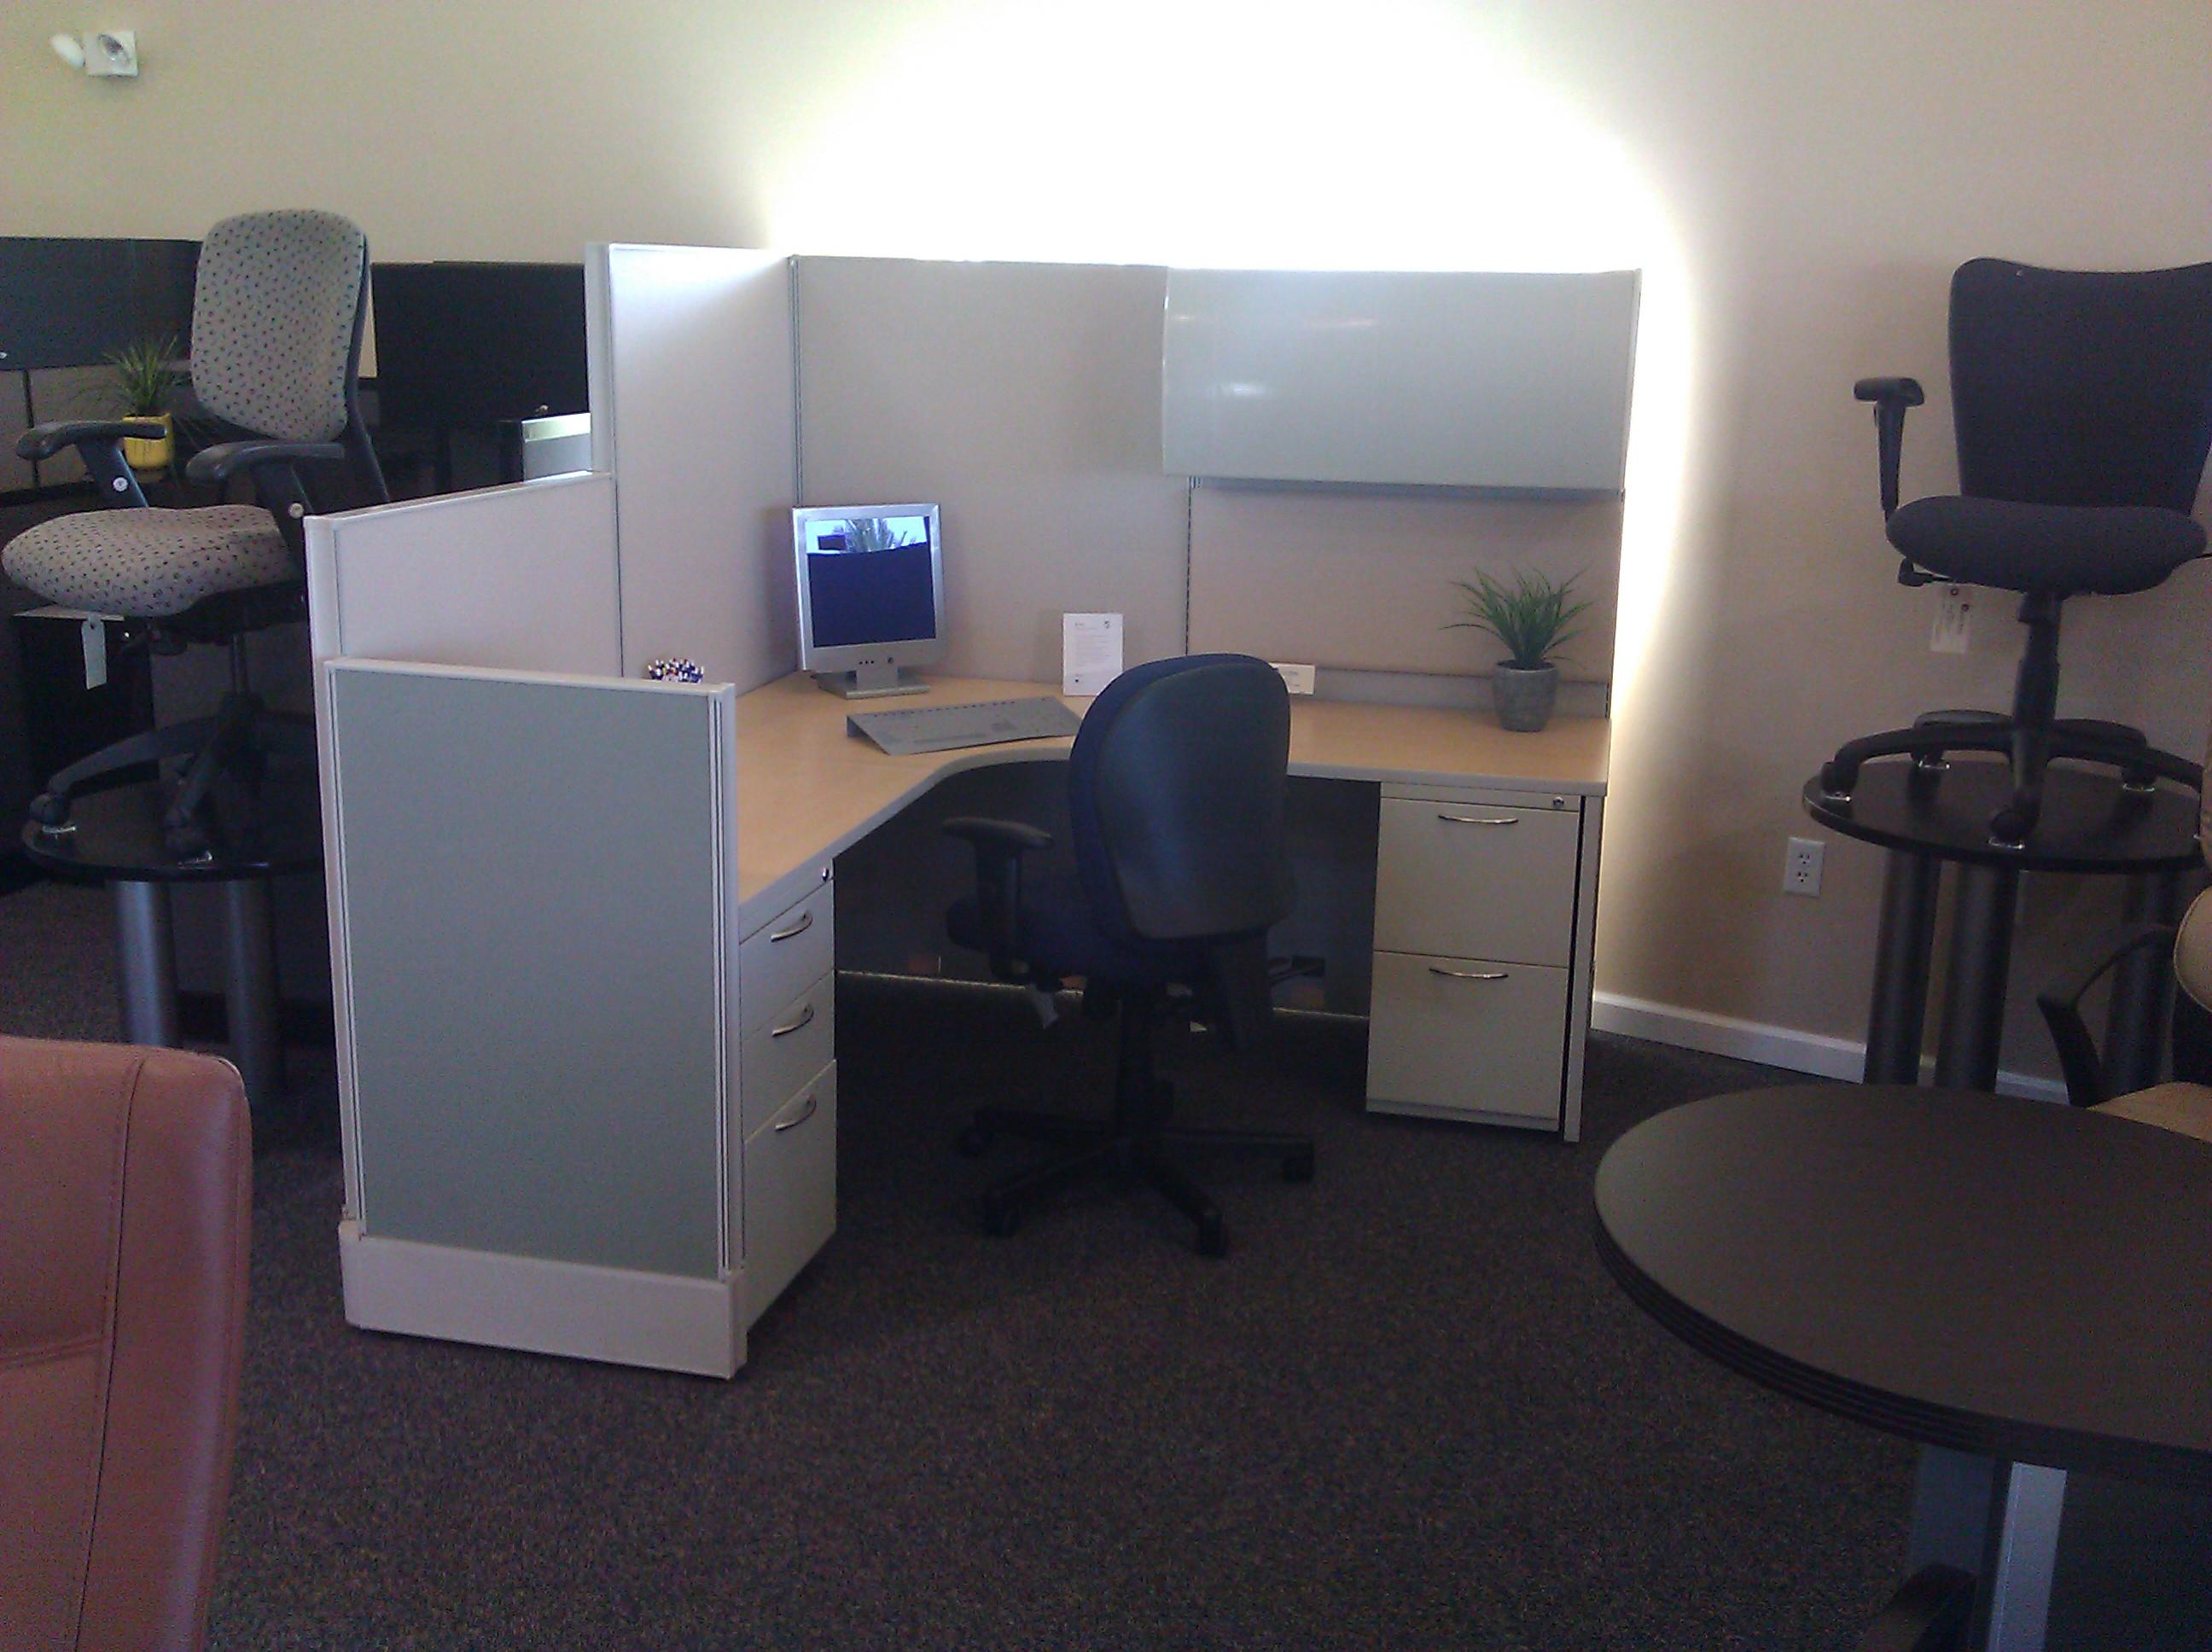 Office Amp Flooring Worx Inc In Oldsmar Fl Whitepages